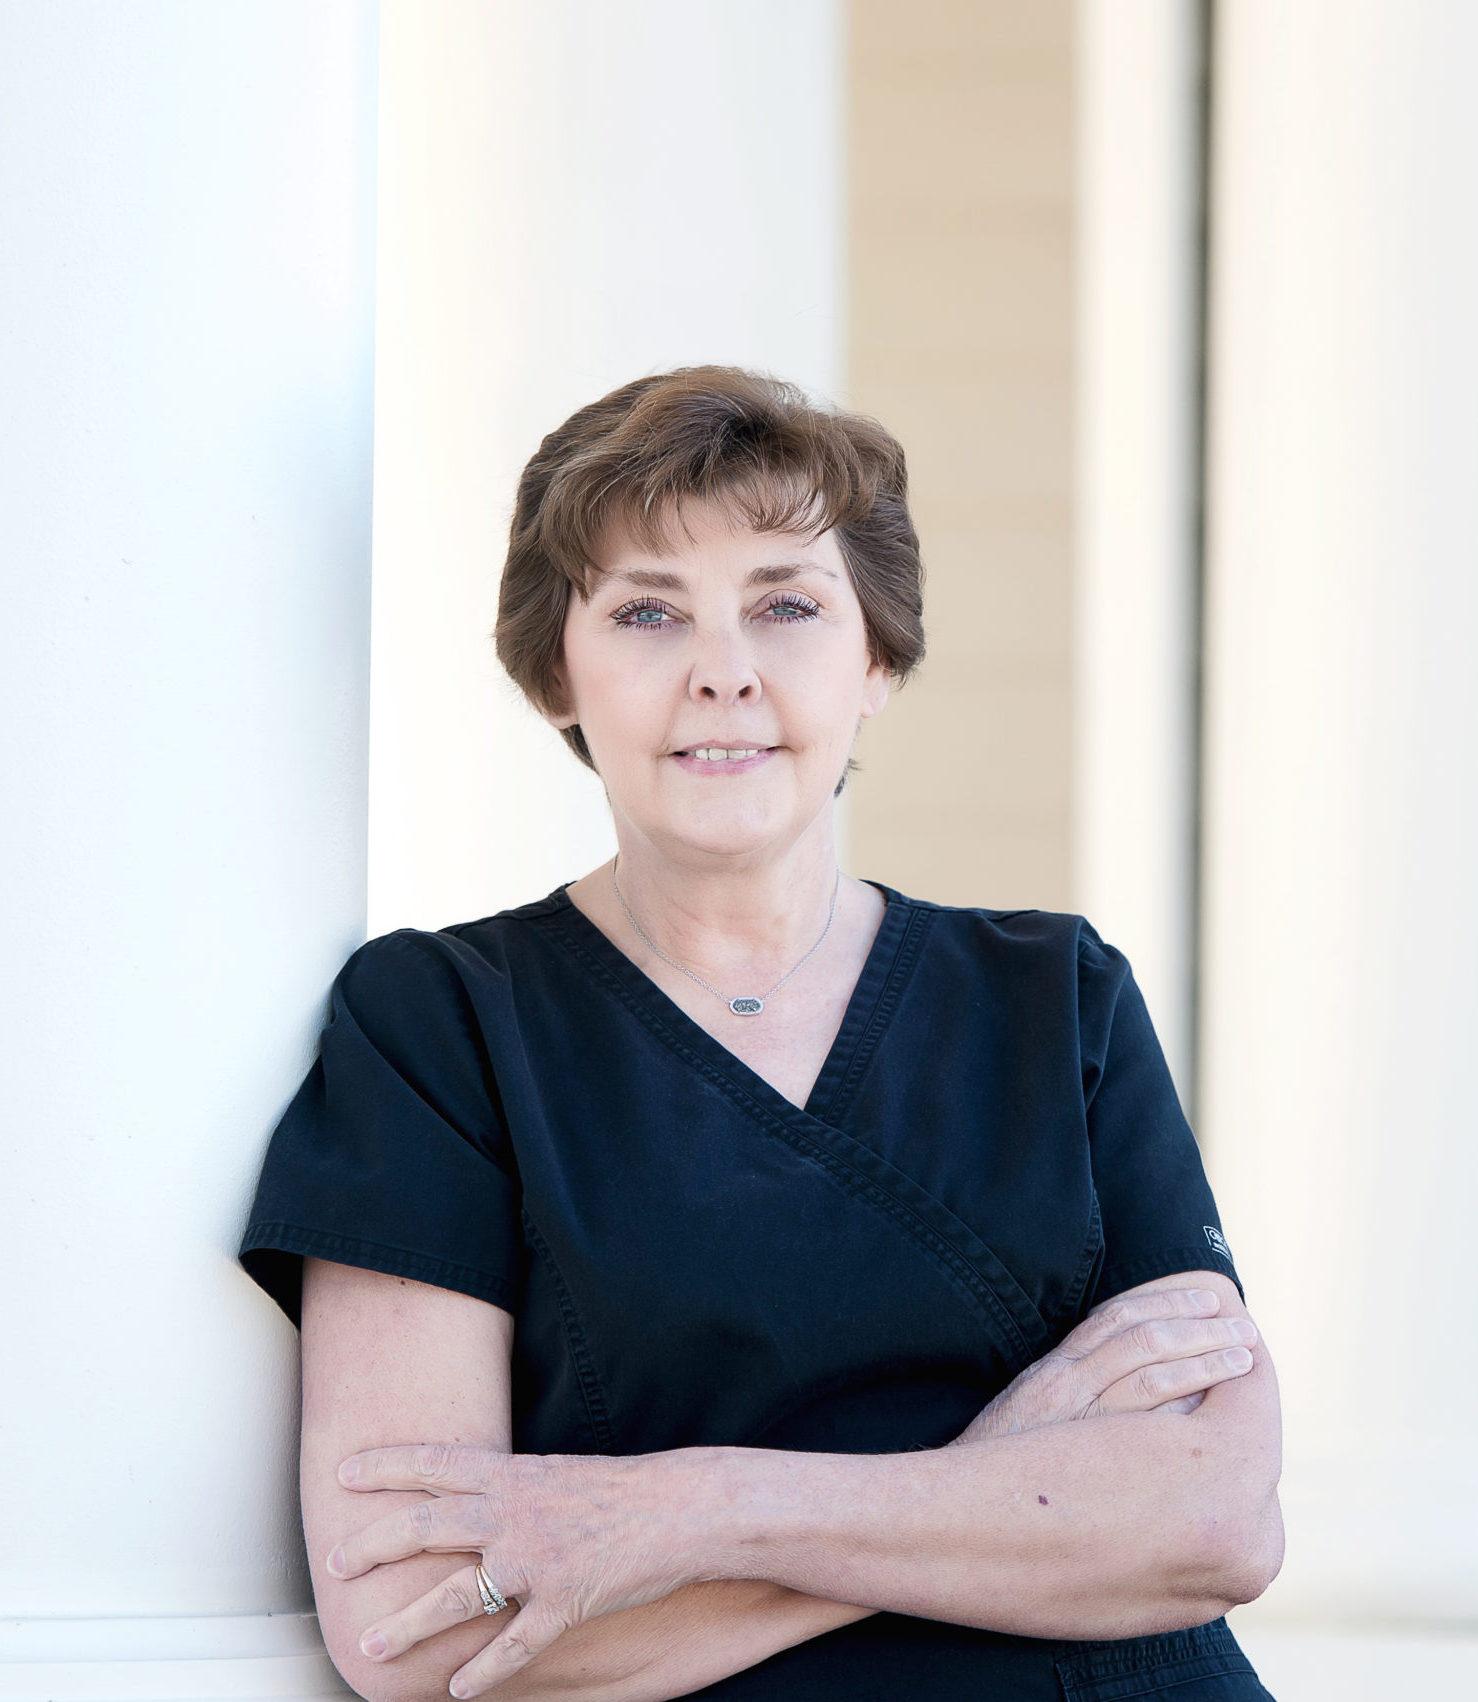 Brenda Pacher